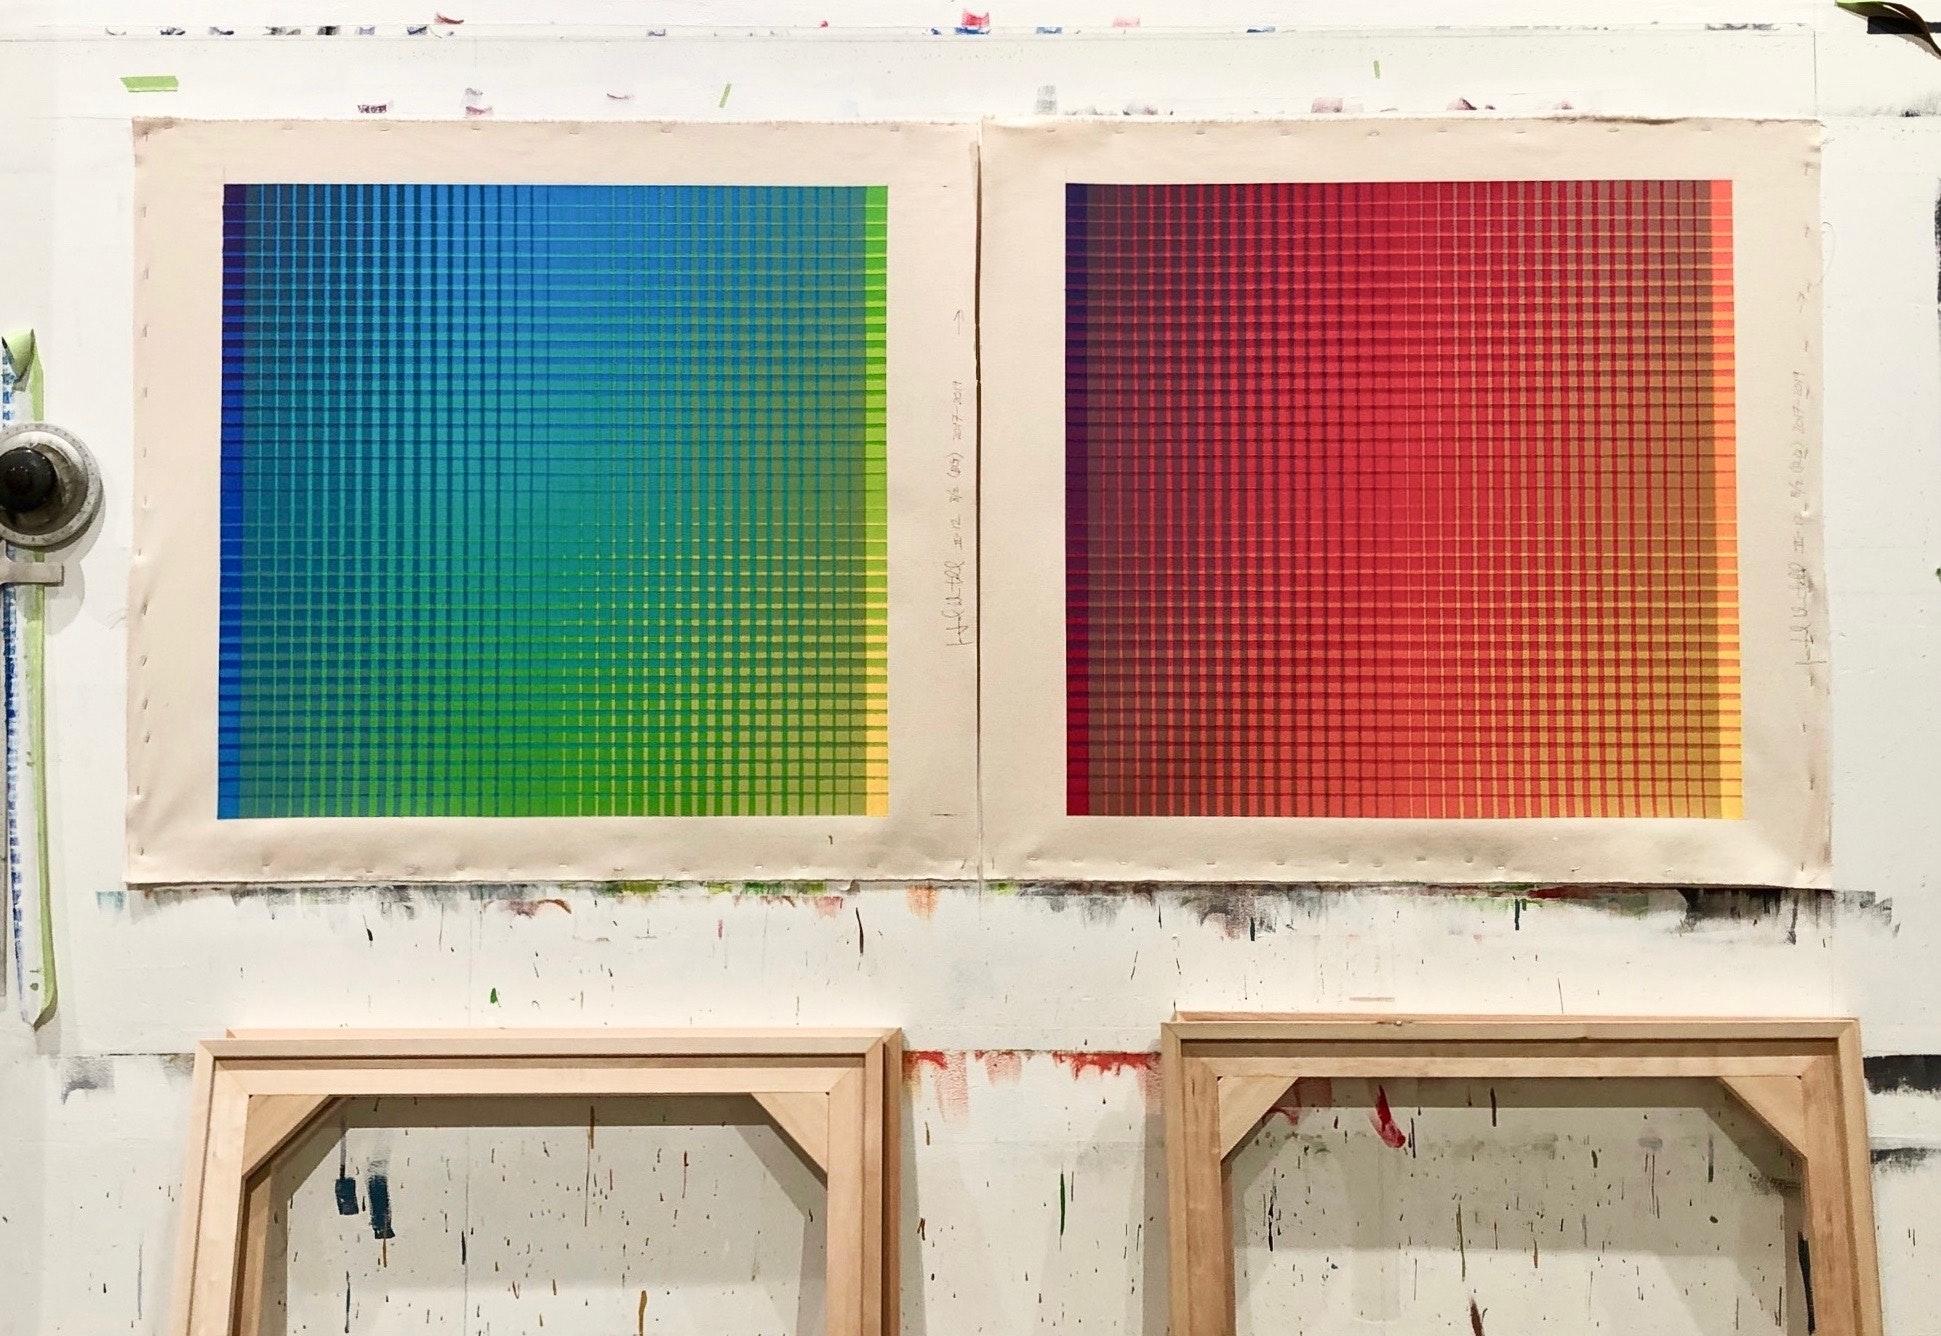 Sanford Wurmfeld: Variations